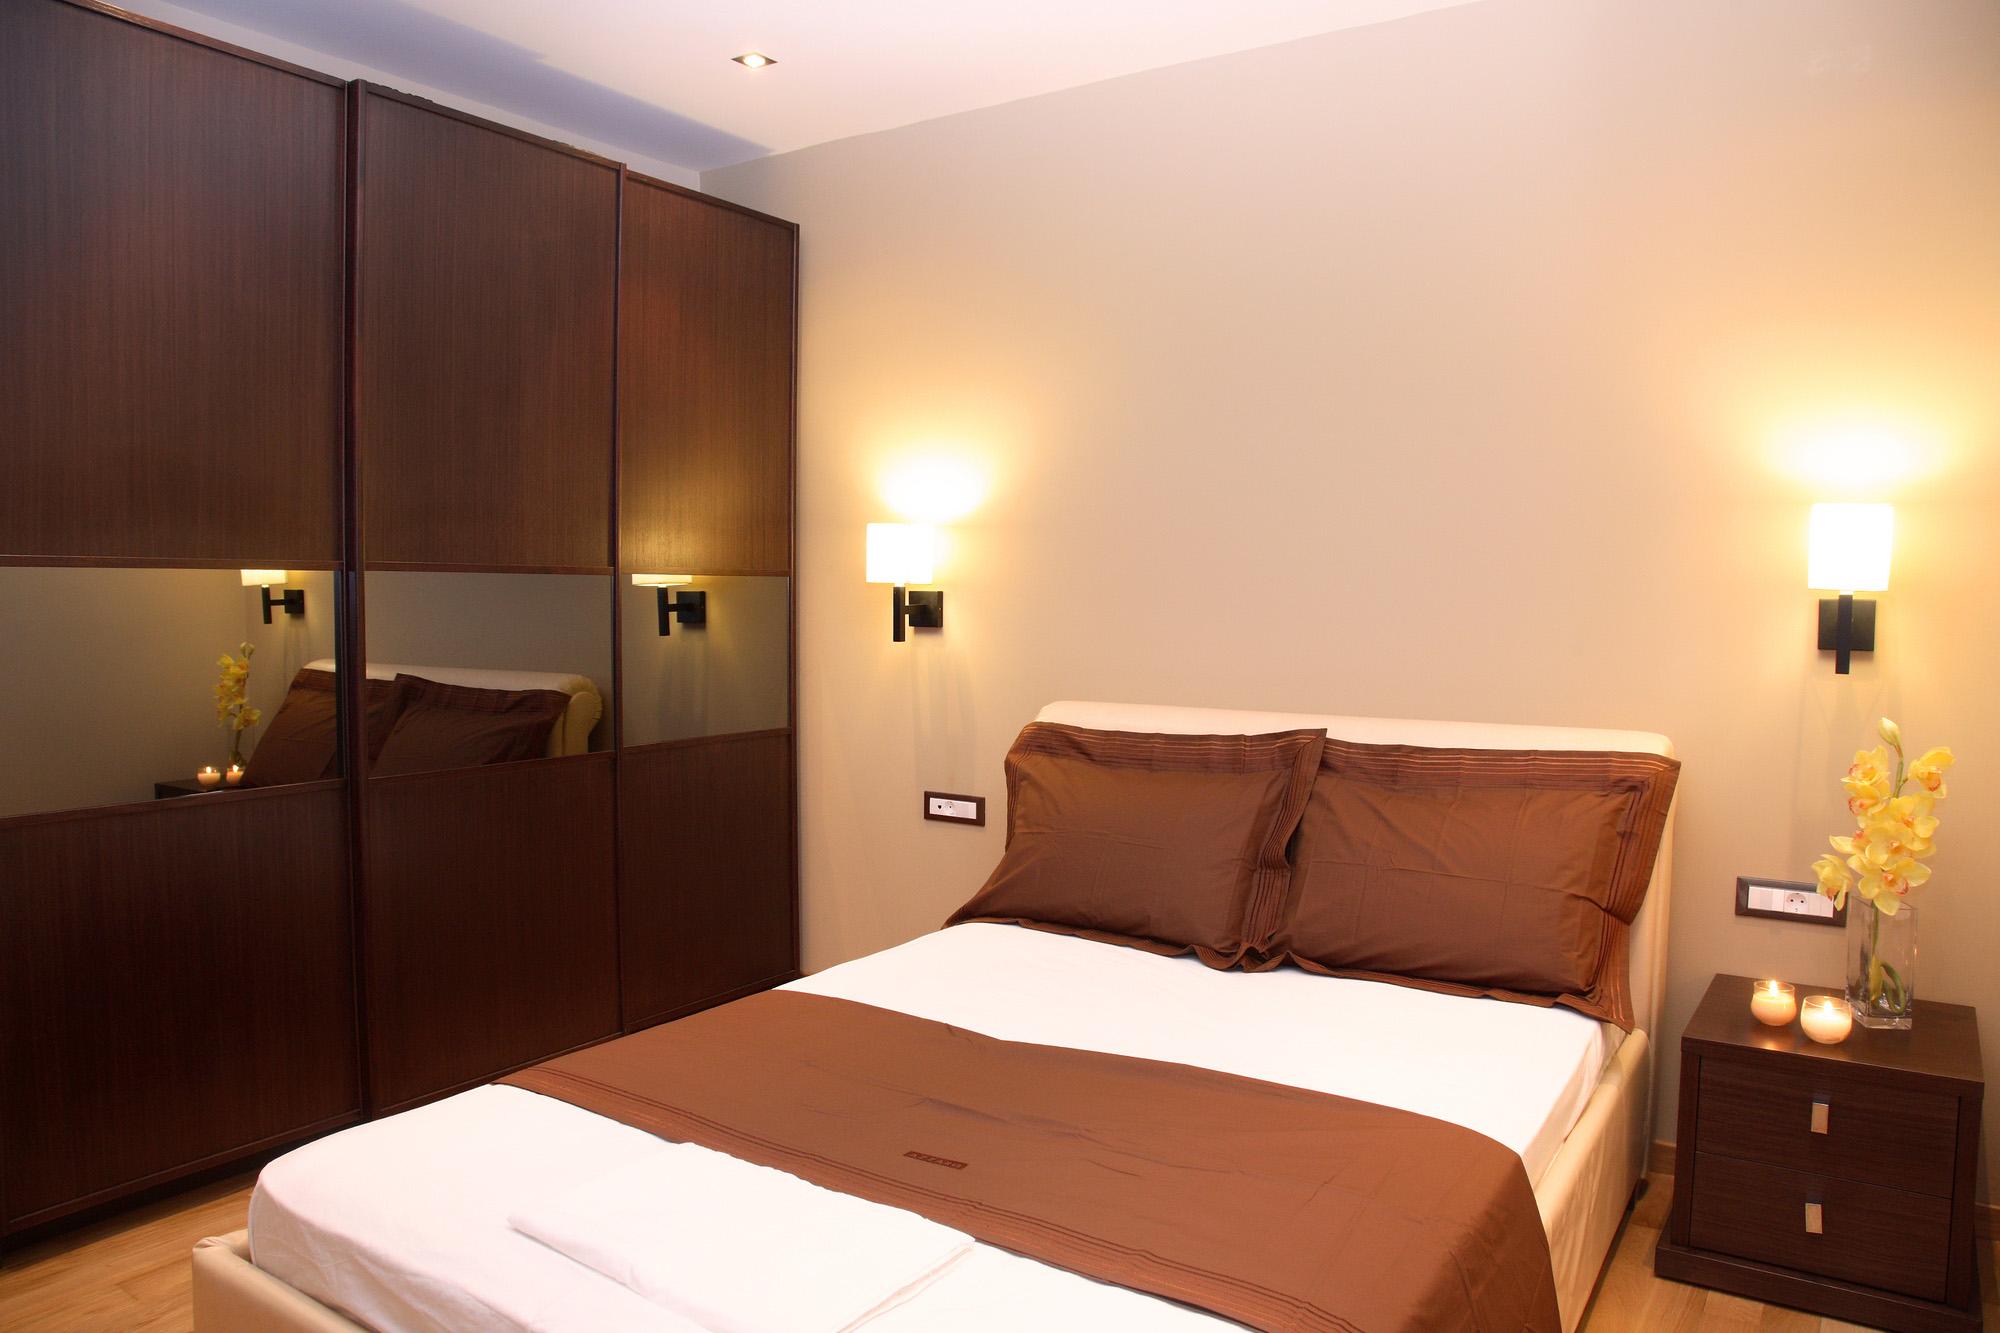 fitted sliding wardrobe, modern wardrobe, bedside table